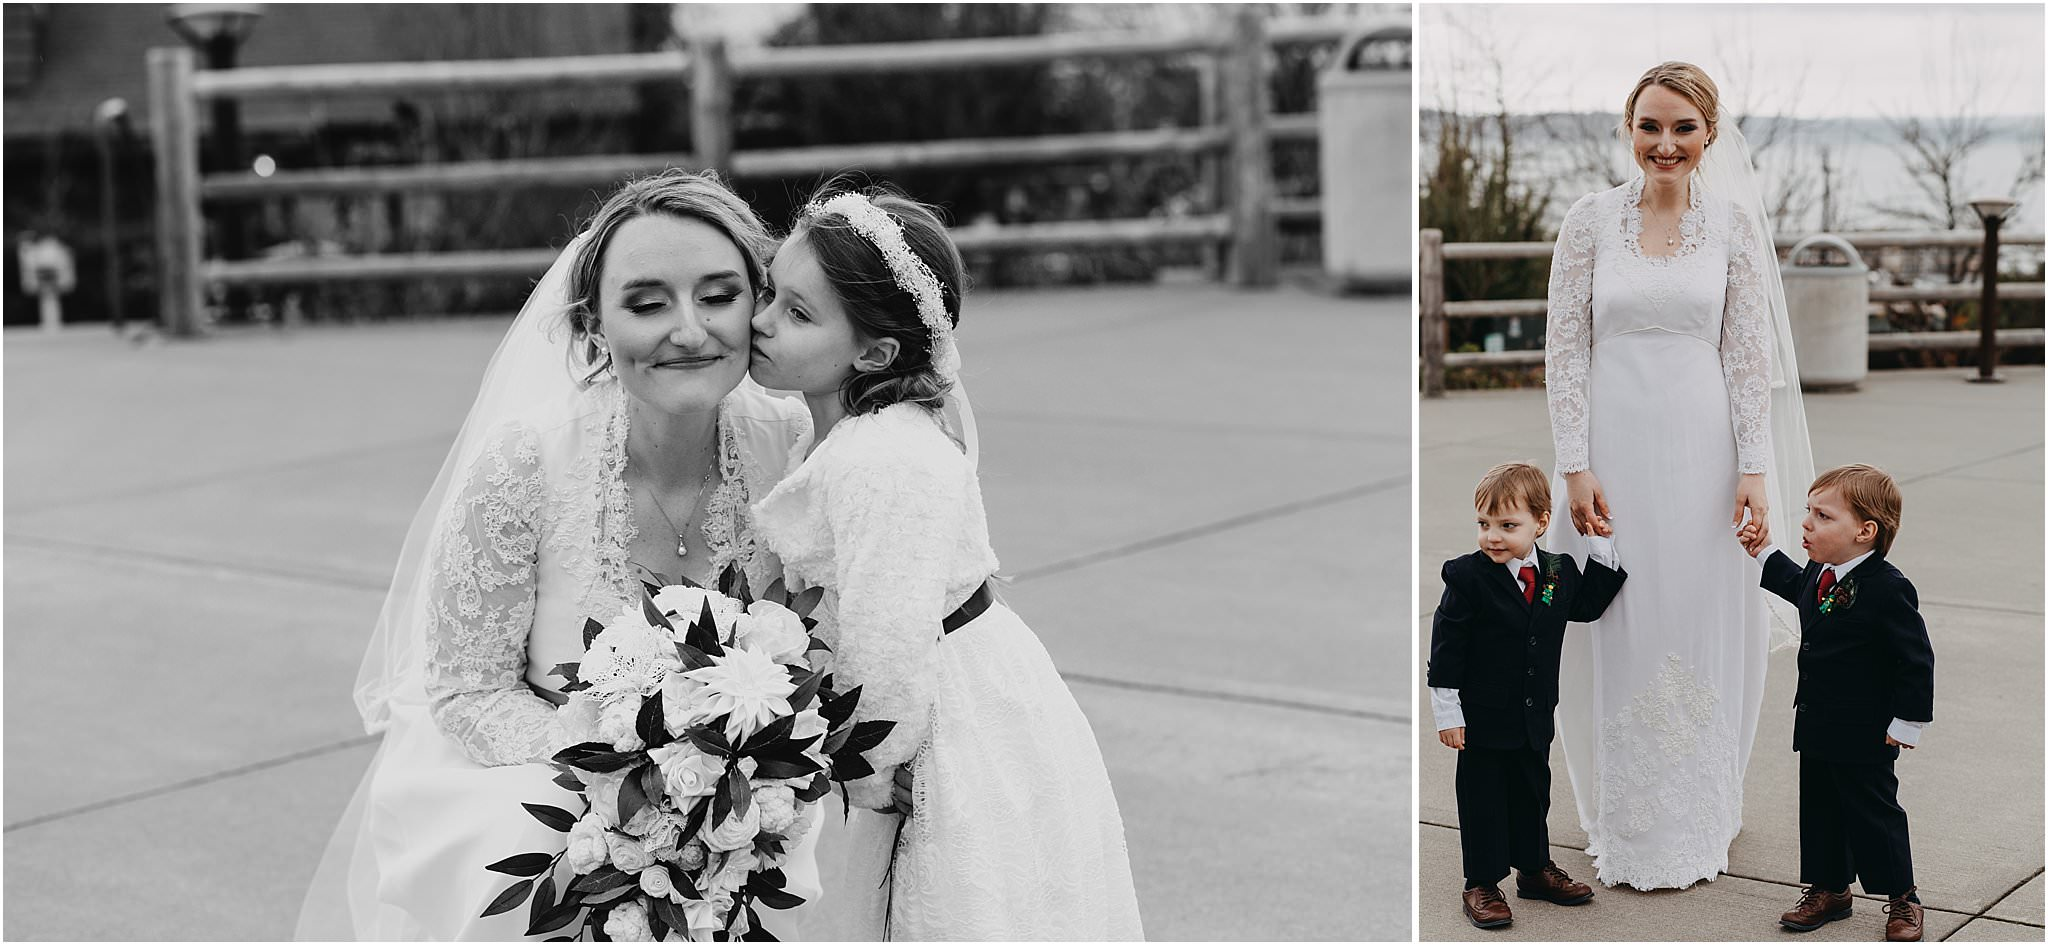 katy-robin-married-in-mukilteo-wedding27.jpg